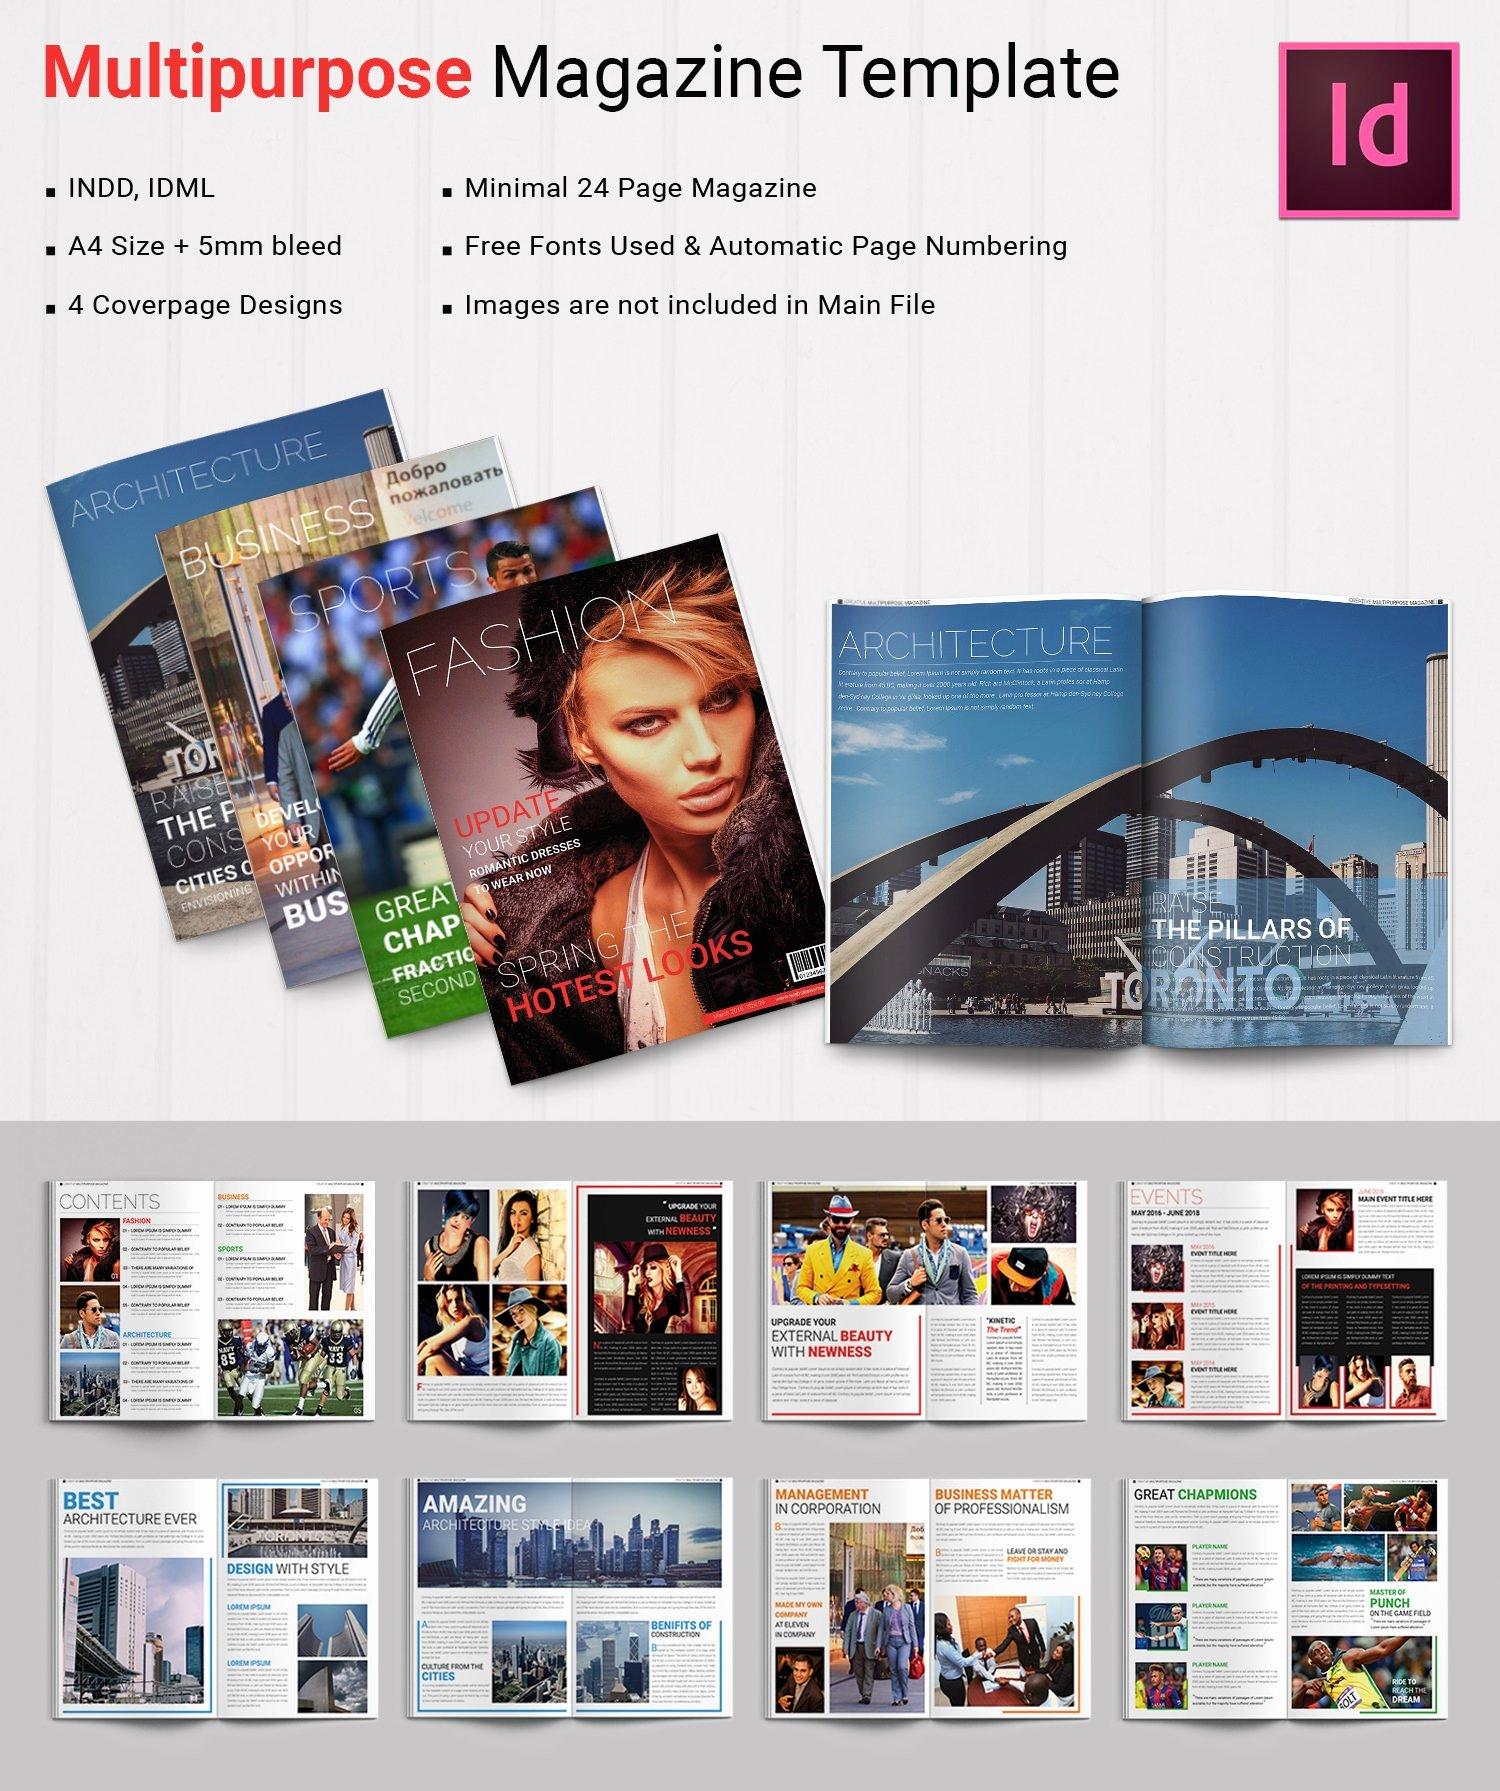 Magazine Template for Microsoft Word Luxury 55 Brand New Magazine Templates Free Word Psd Eps Ai